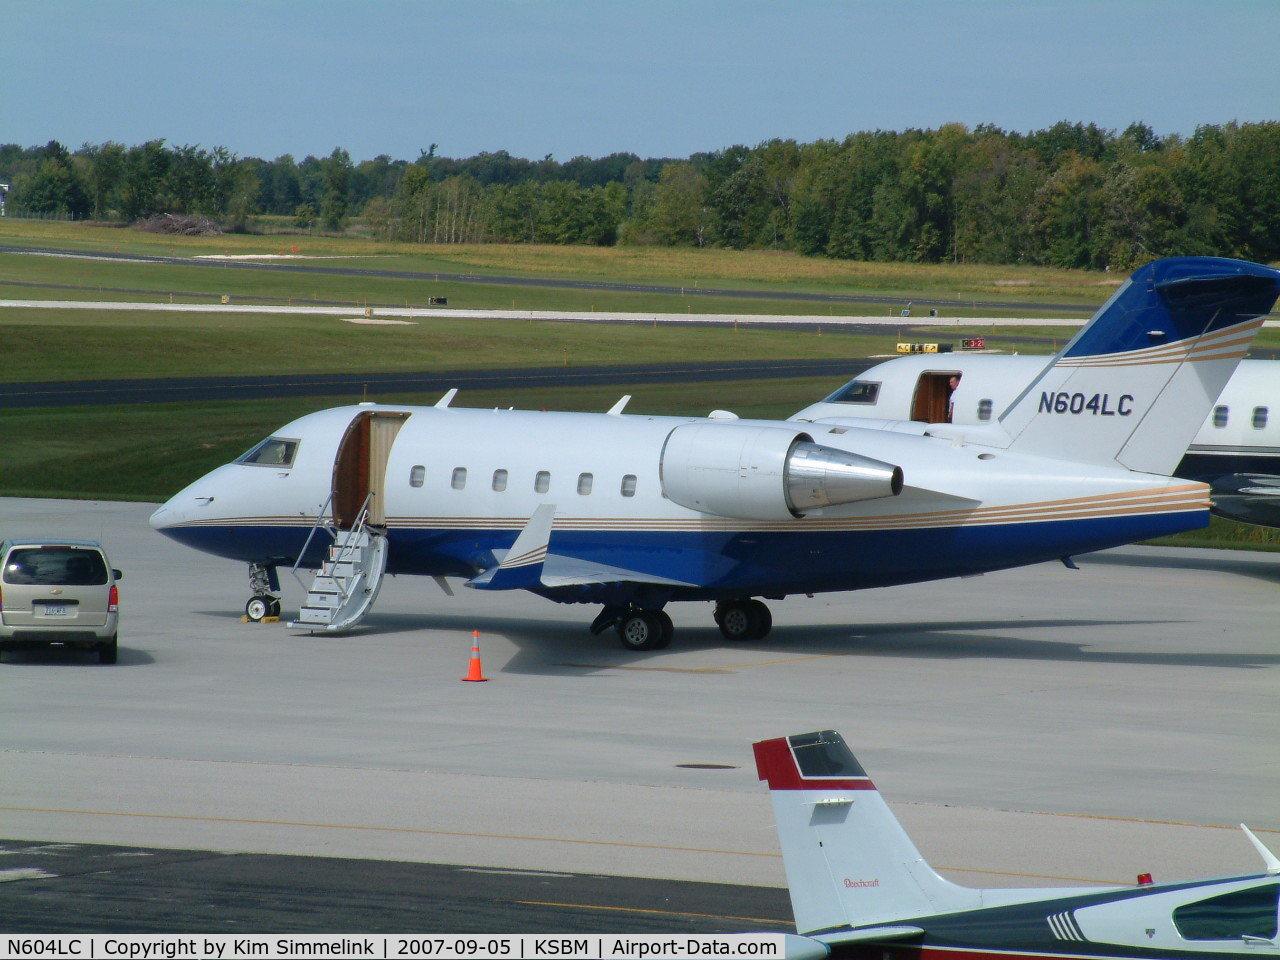 N604LC, 1998 Bombardier Challenger 604 (CL-600-2B16) C/N 5373, N604LC at KSBM